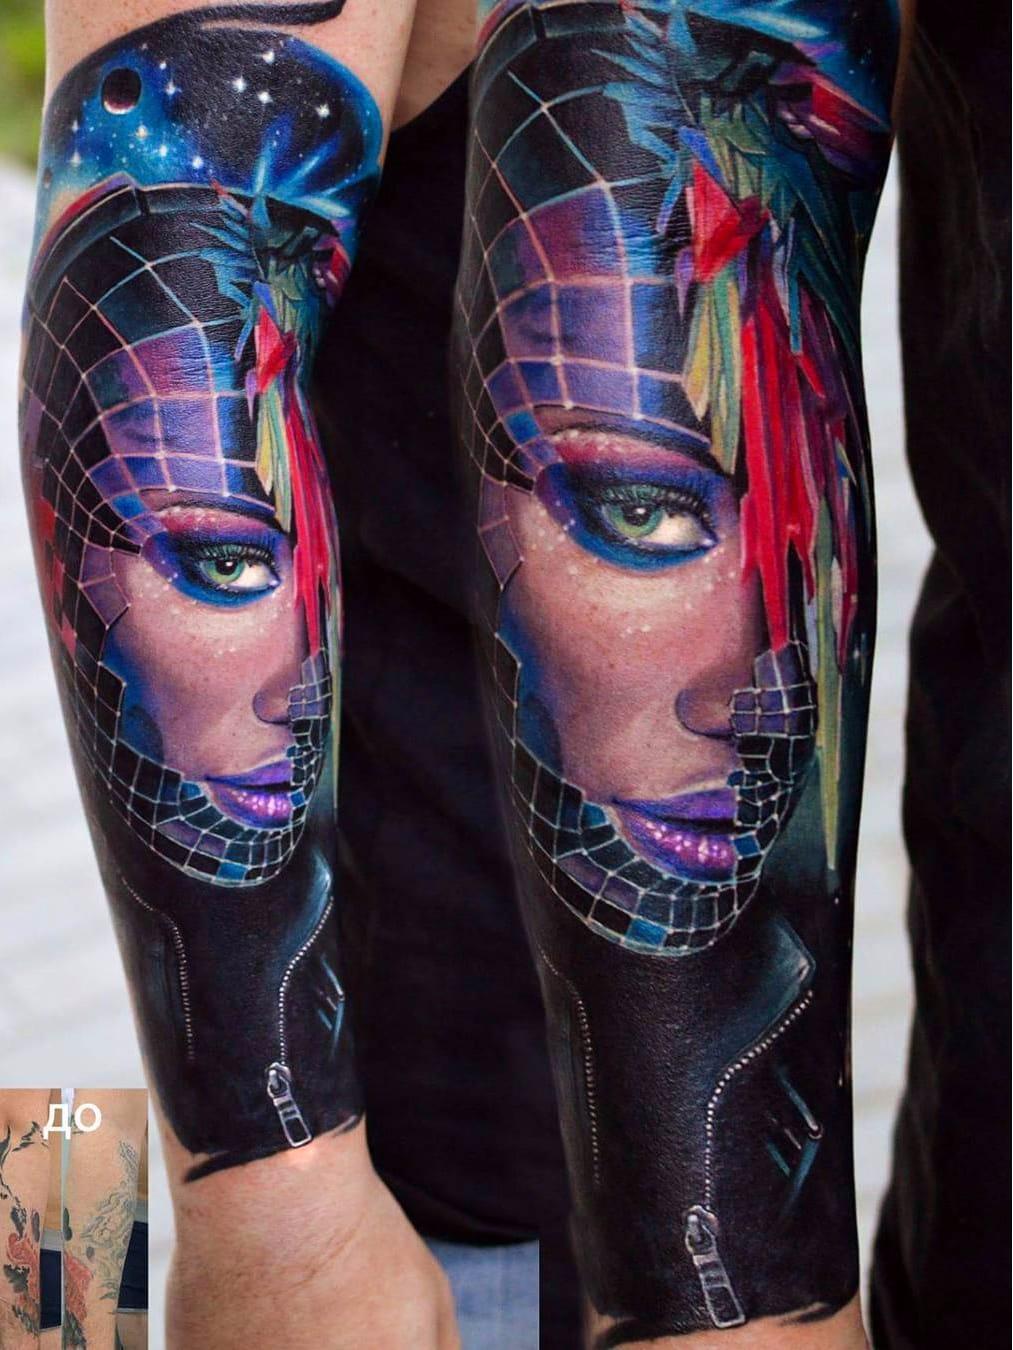 Cover up #VasilySuvorov #gringo #realismo #realism #realismocolorido #mulher #woman #girl #garota #galaxy #galaxya #universo #universe #cosmic #cosmica